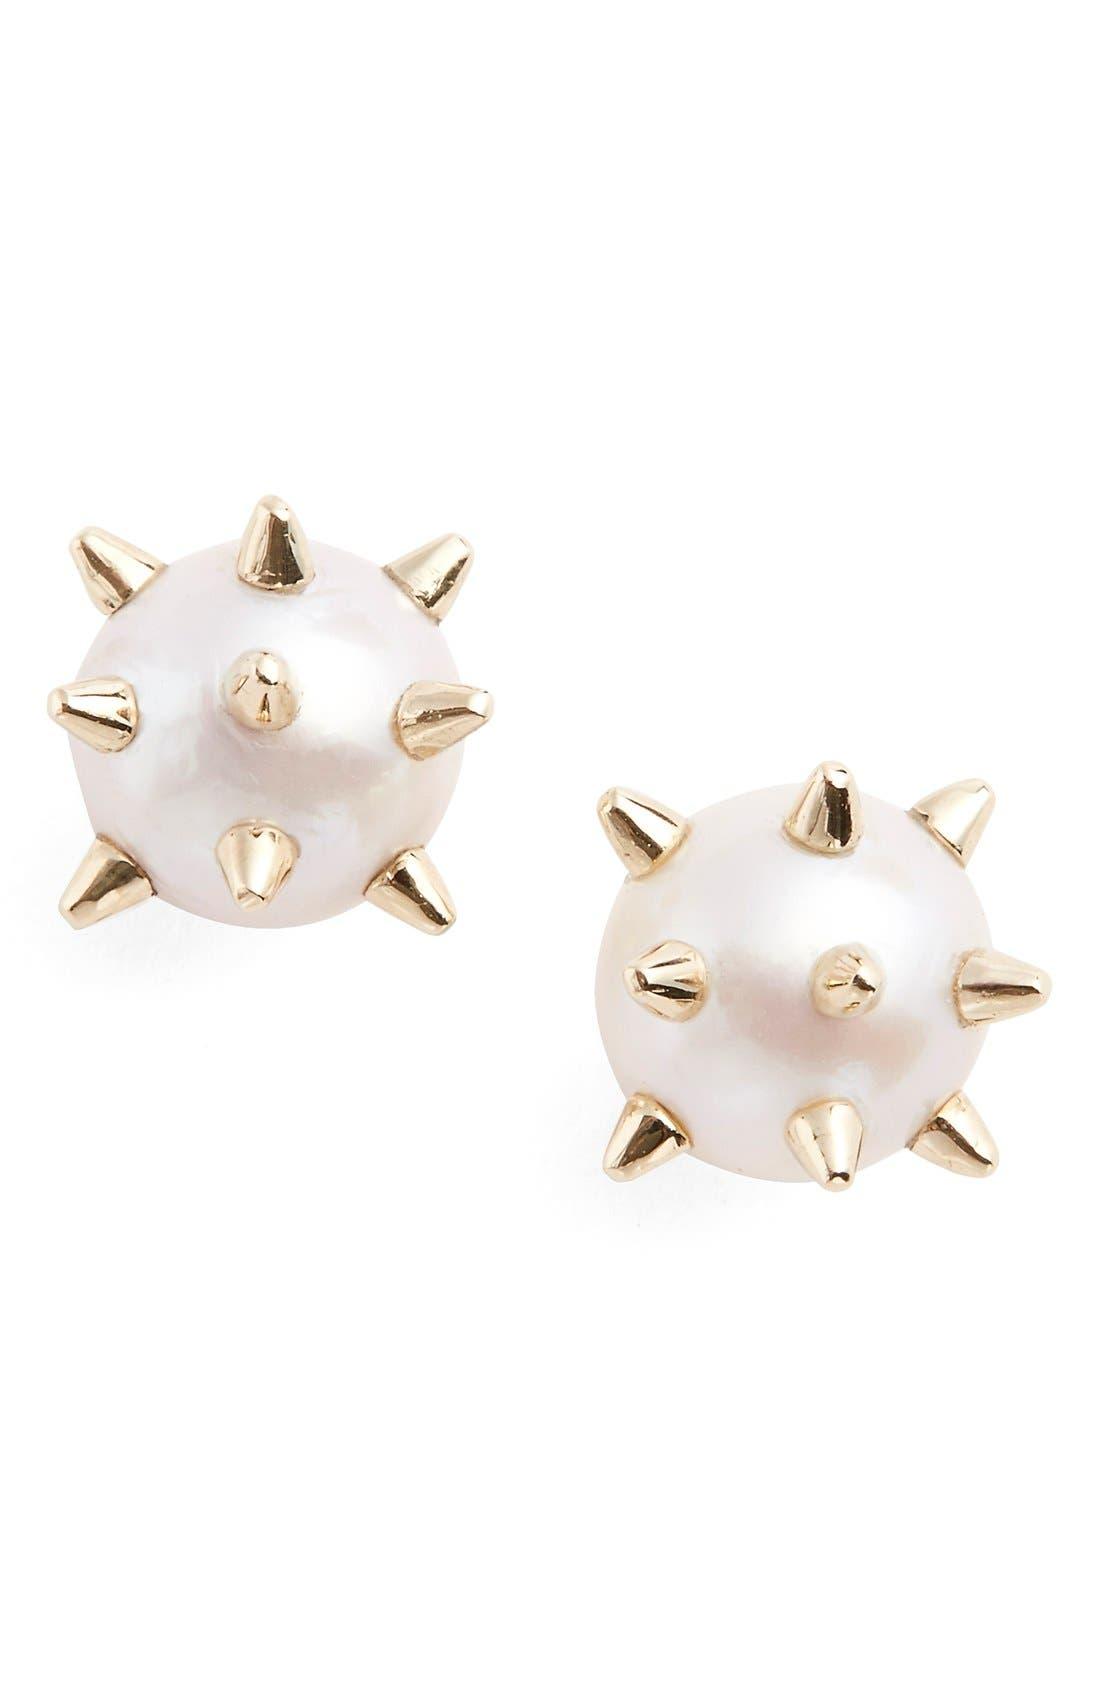 Alternate Image 1 Selected - Nektar de Stagni 'New Classics' Spike Cultured Pearl Earrings